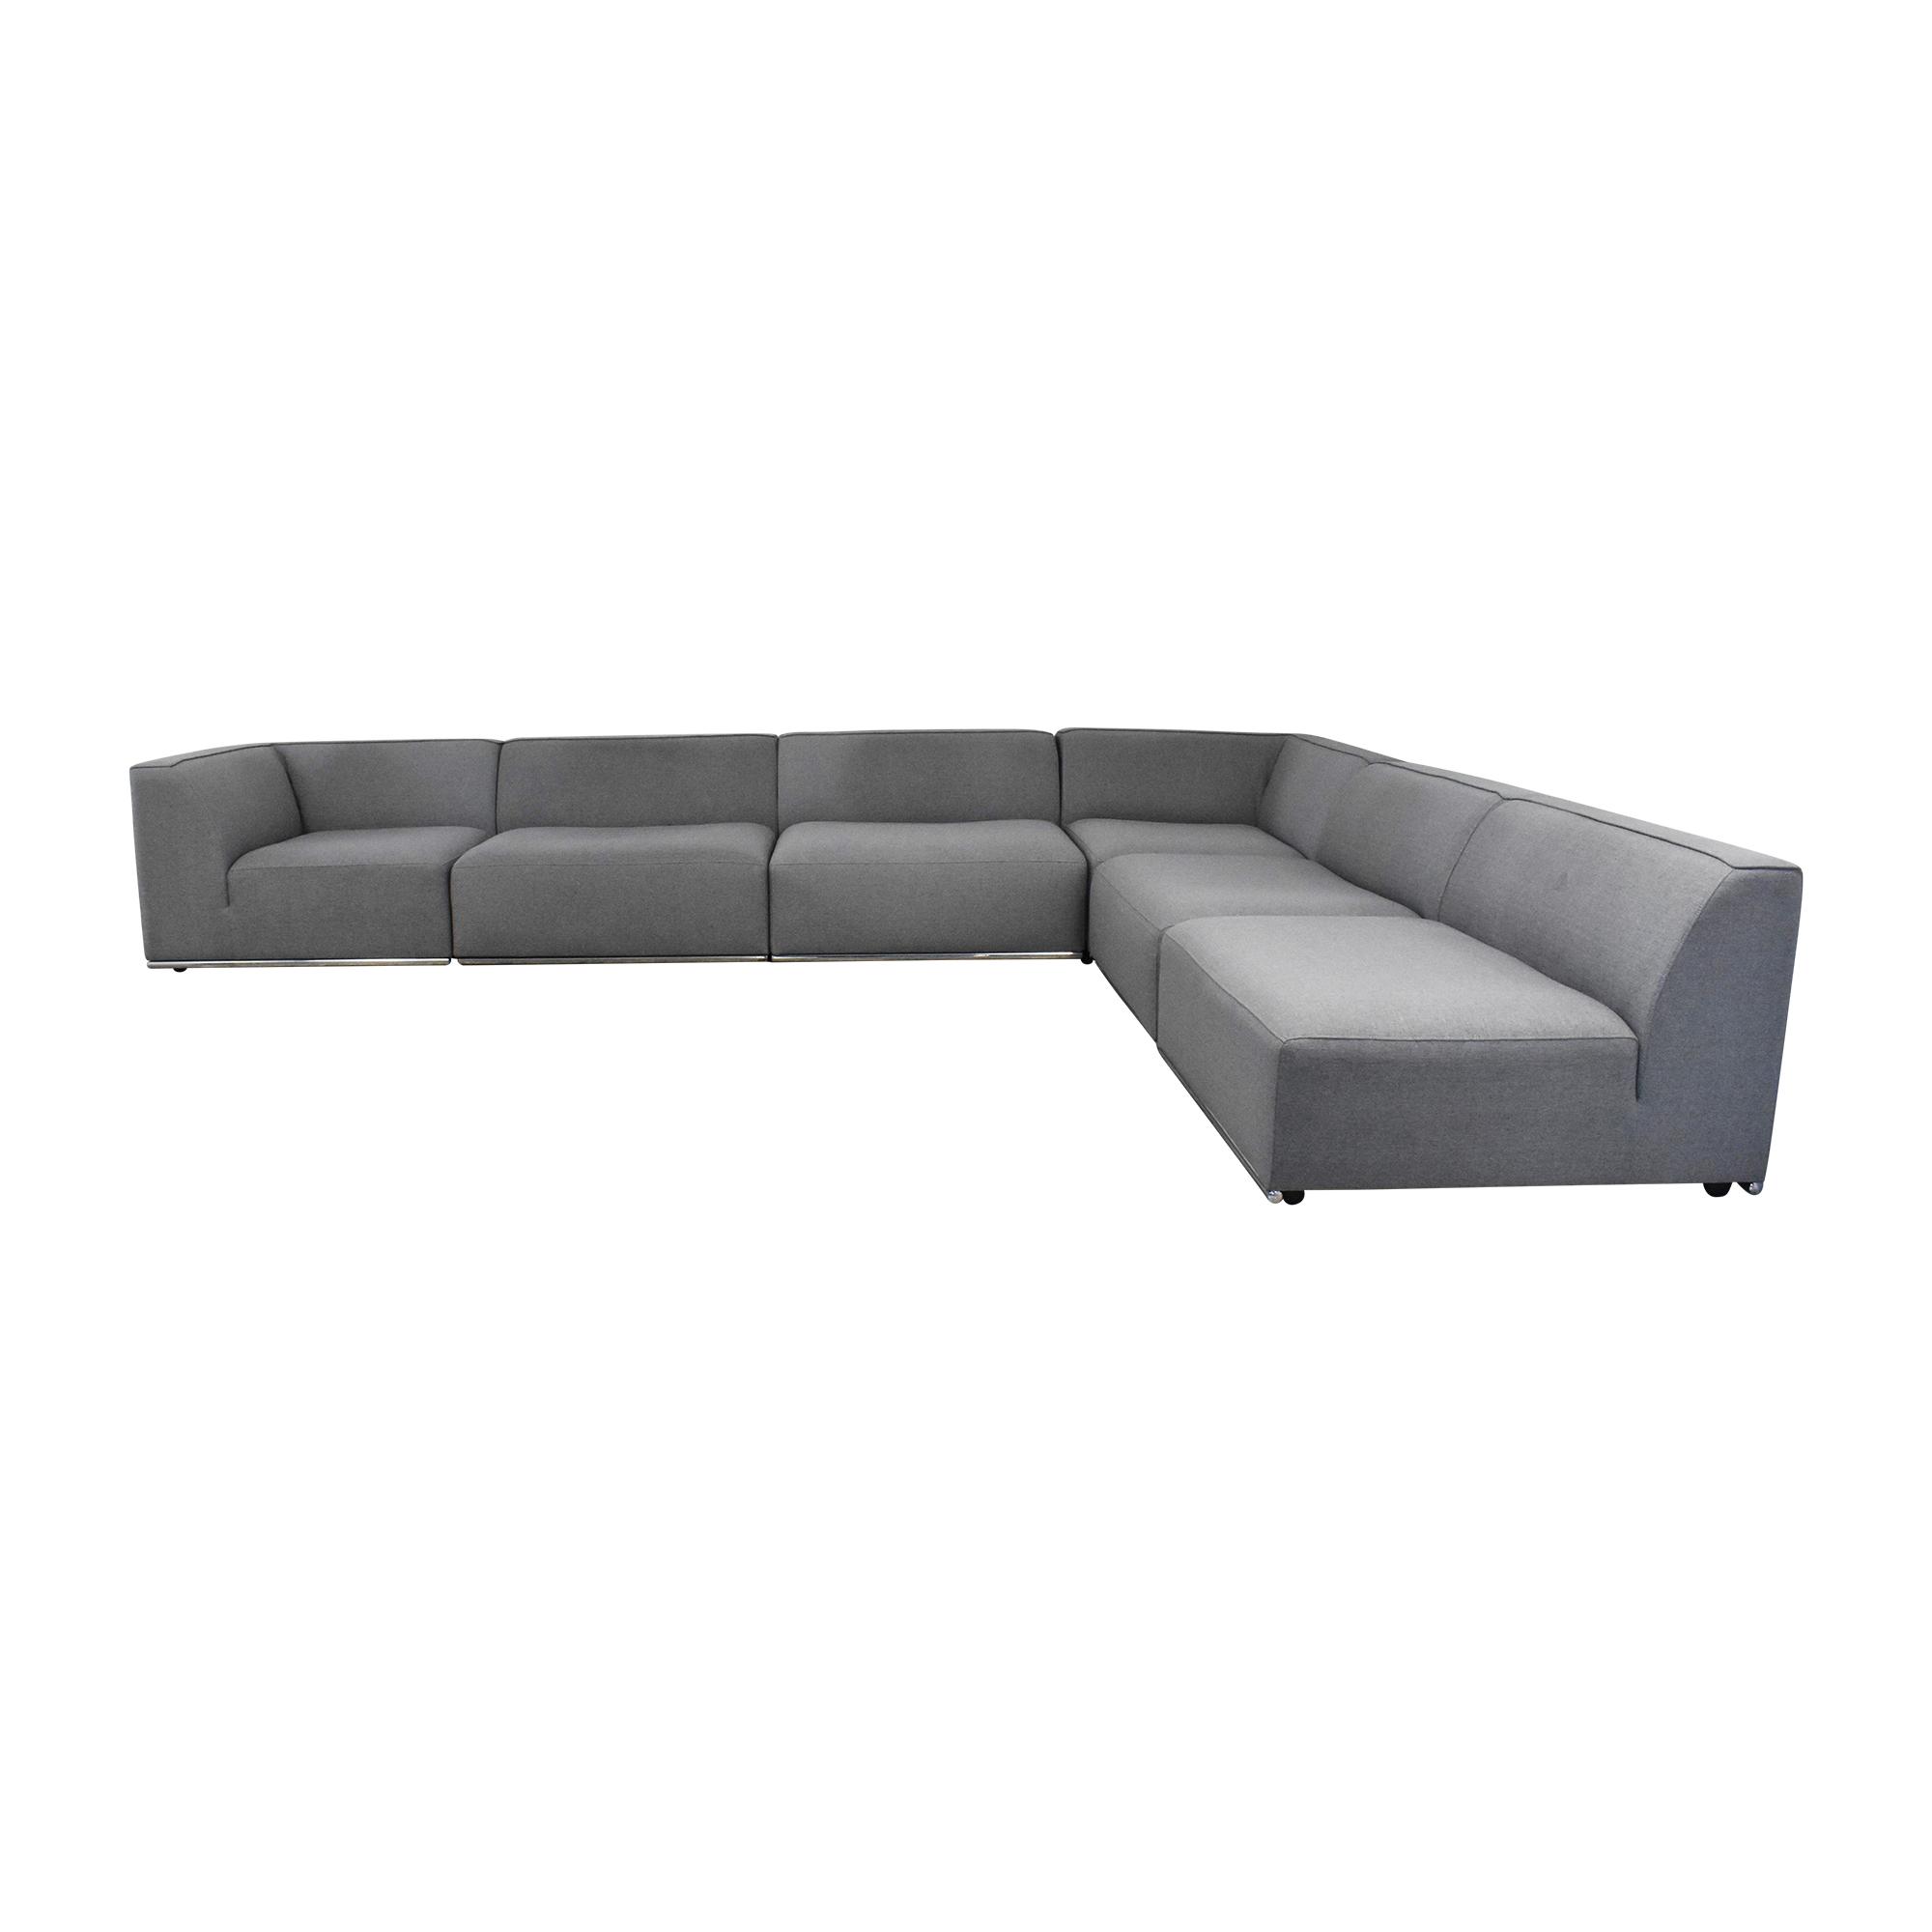 buy Safavieh Safavieh Modular Sectional Sofa online